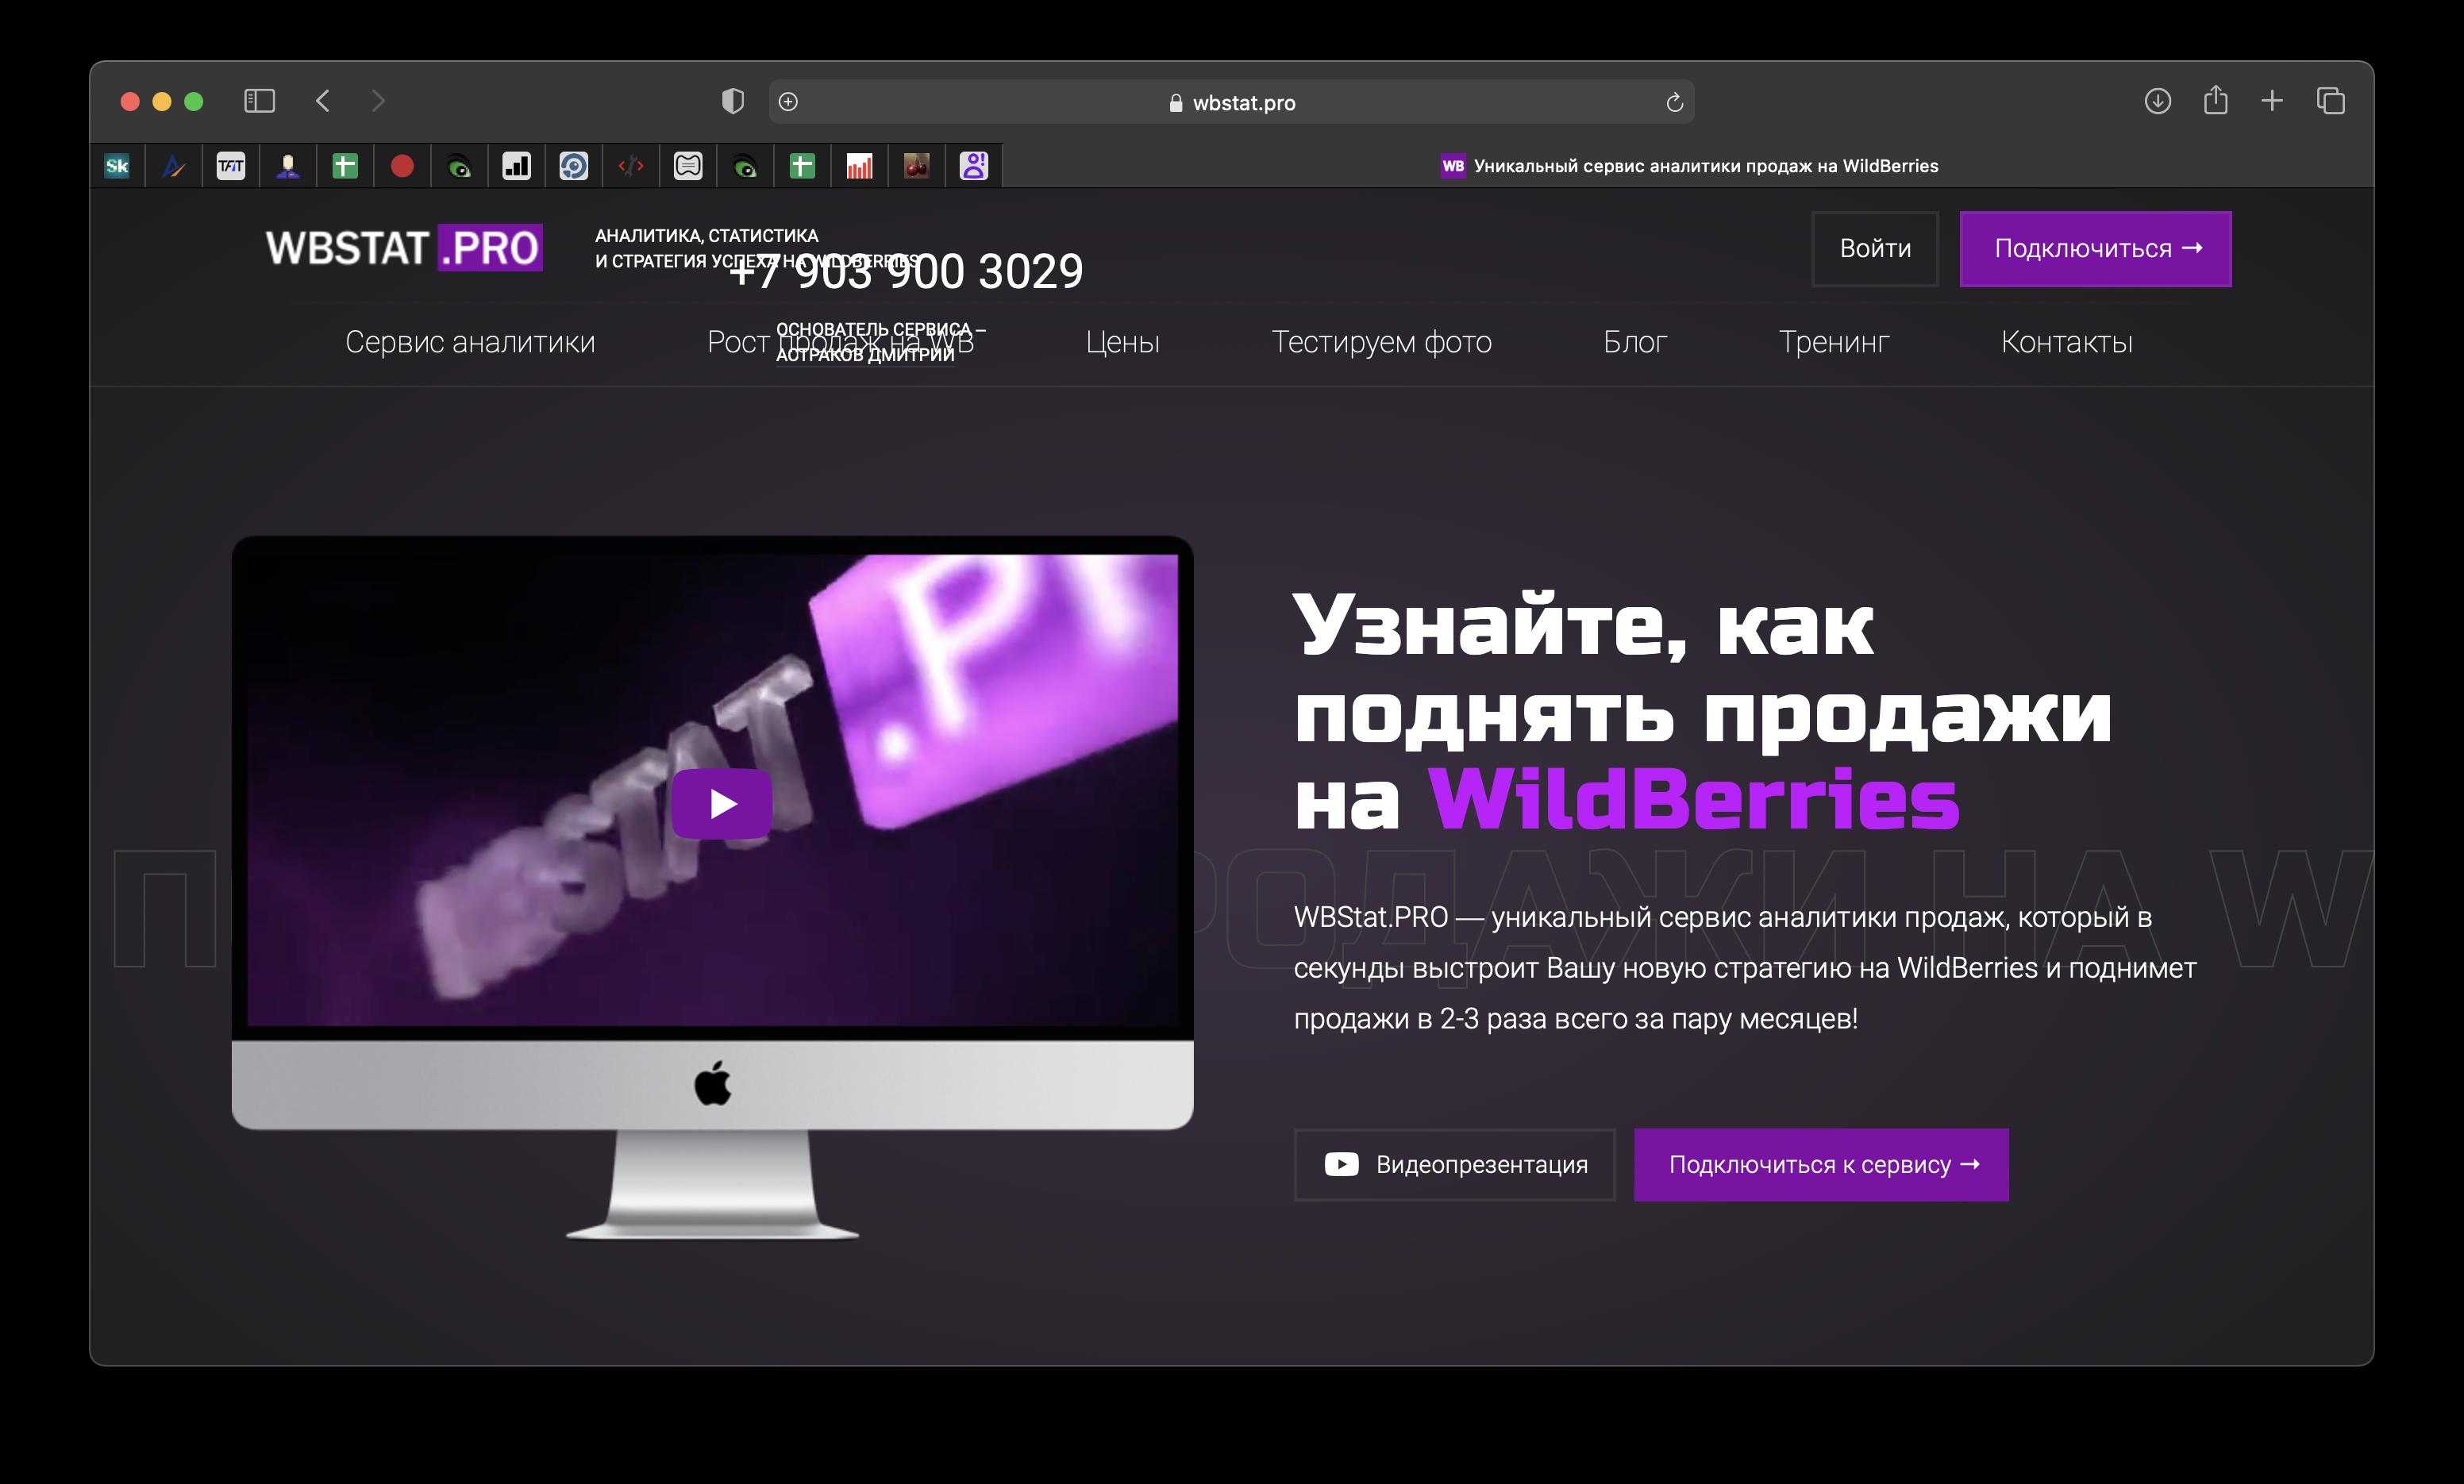 сайт сервиса wbstat